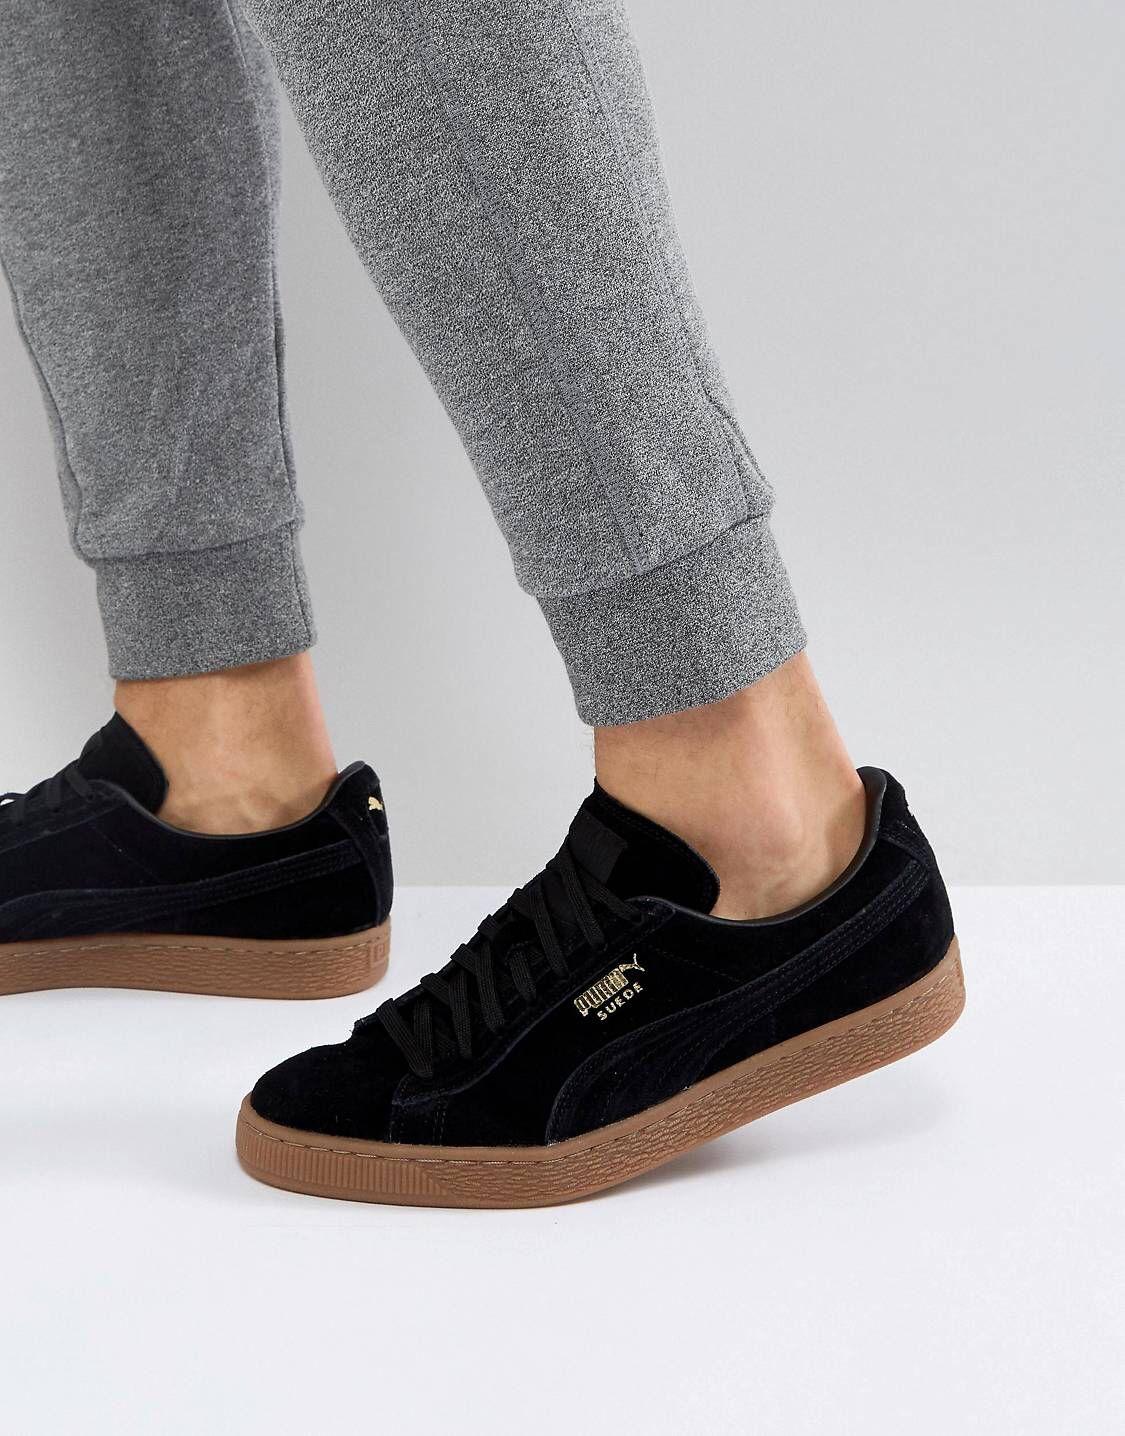 plus récent cdb24 fe516 Puma Suede Gum Sole Sneakers In Black 36324221   Footwear in ...